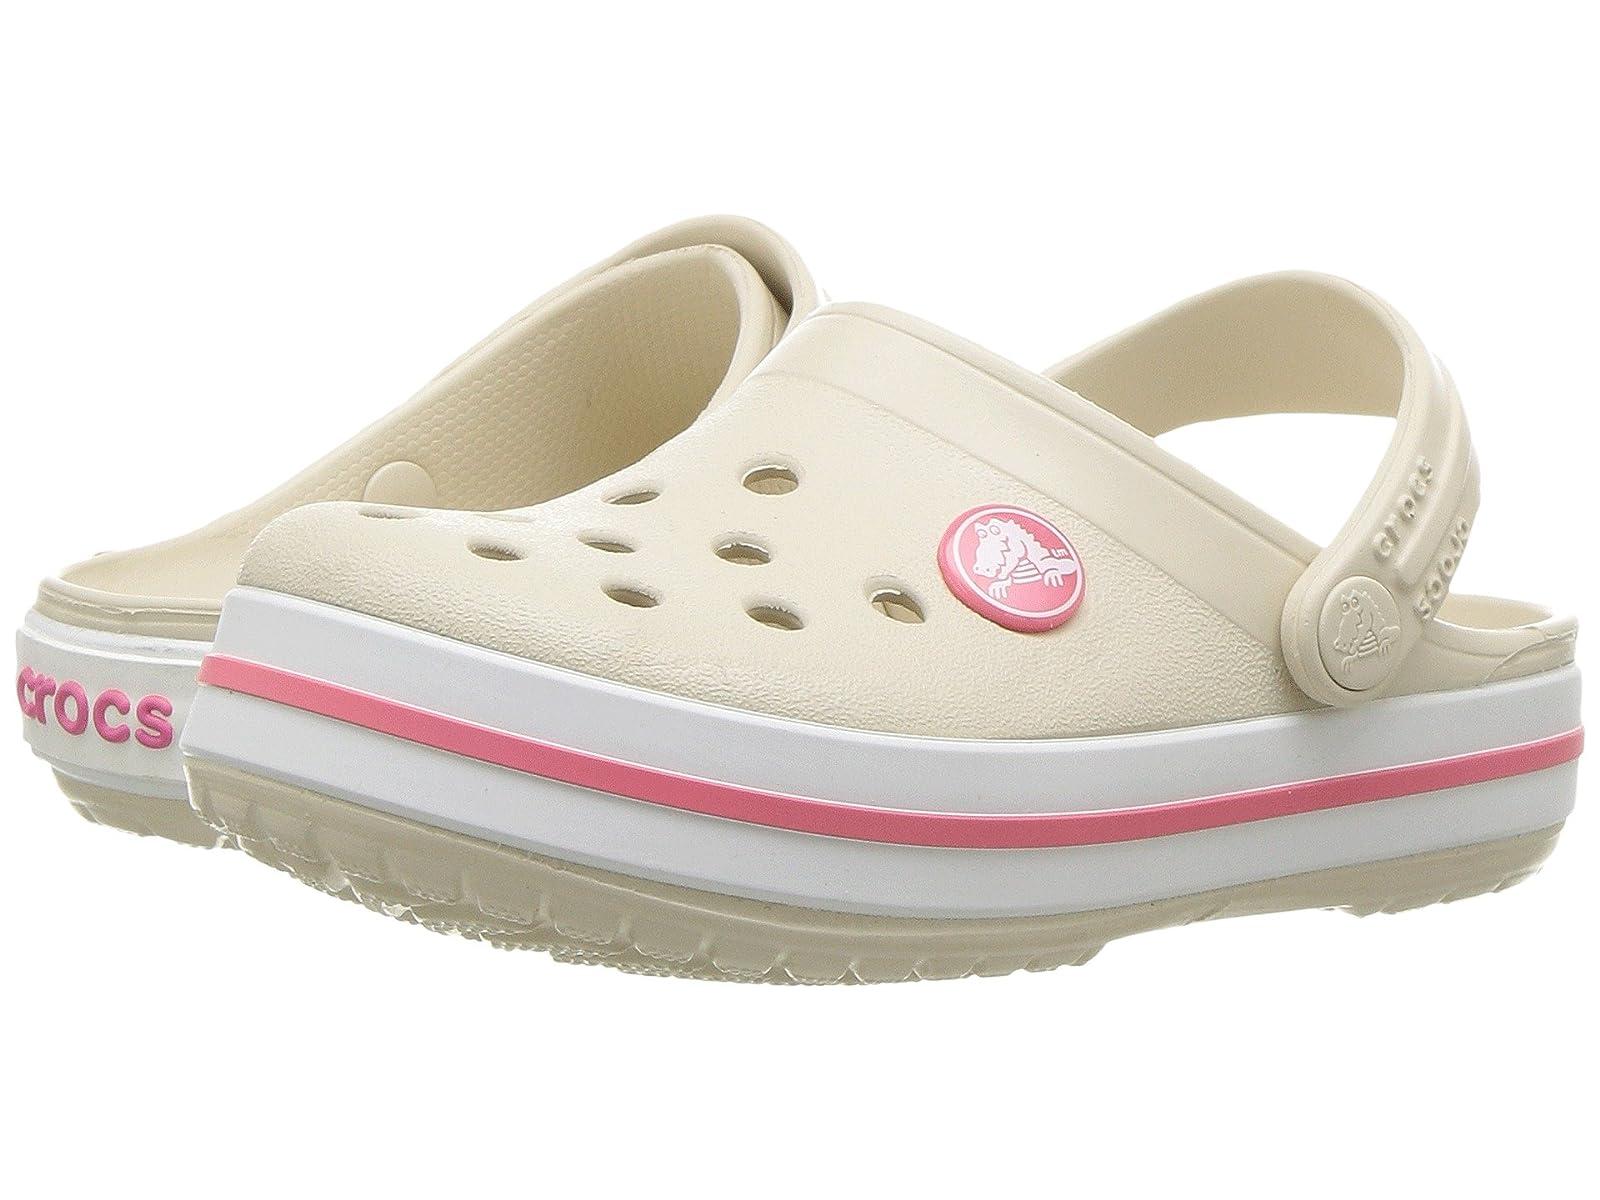 Crocs Clog Kids Crocband Clog Crocs (Toddler/Little Kid) :Sales, Snatch:Man/Woman 65905d